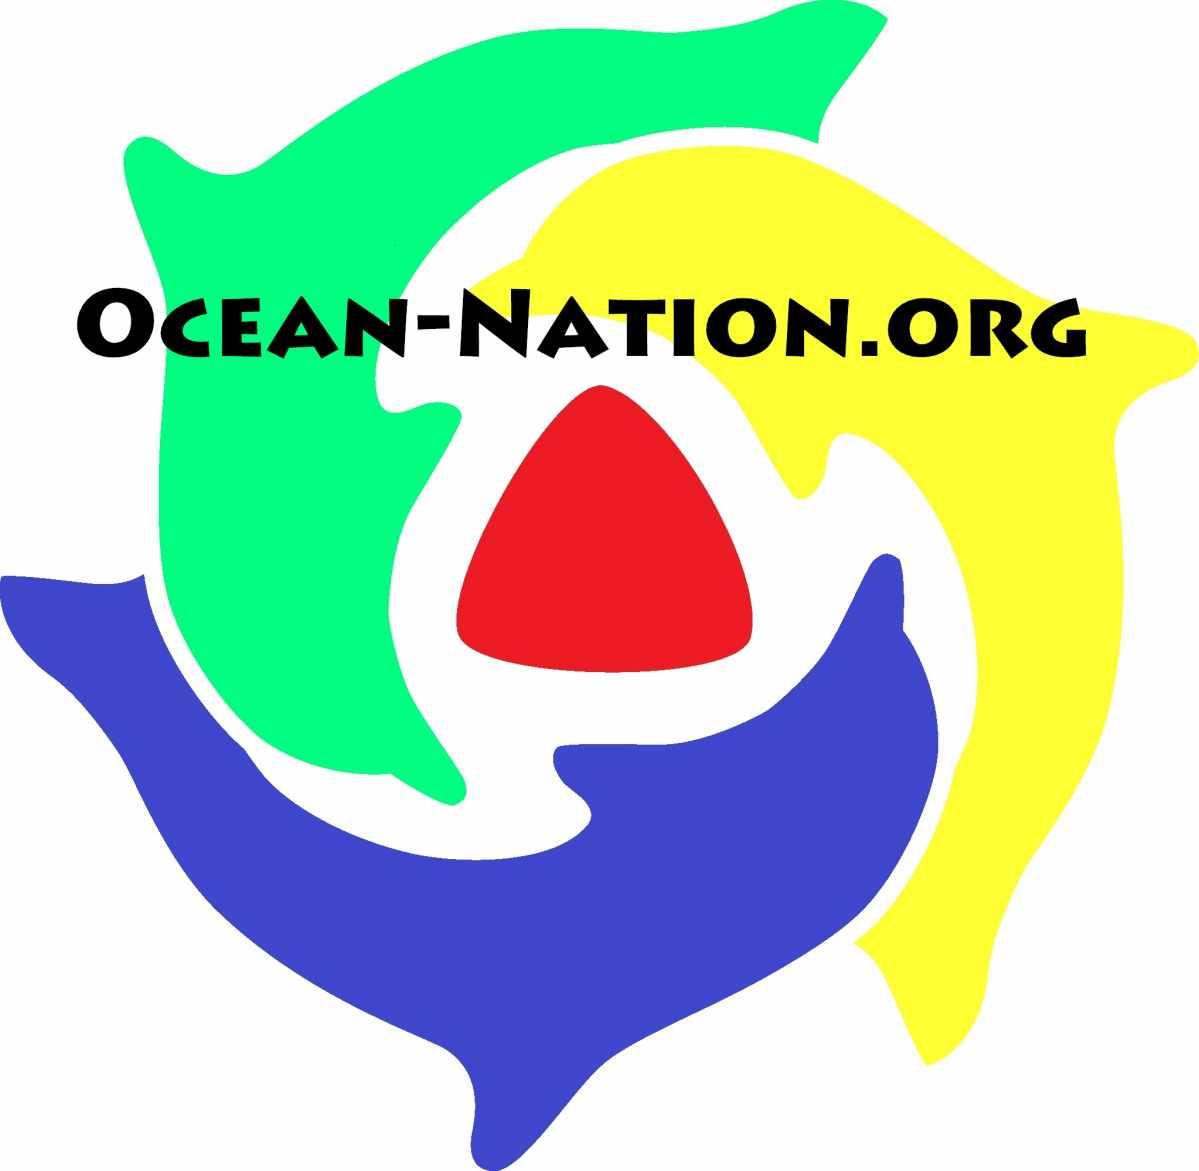 Aros Crystos and Ocean Nation Logo